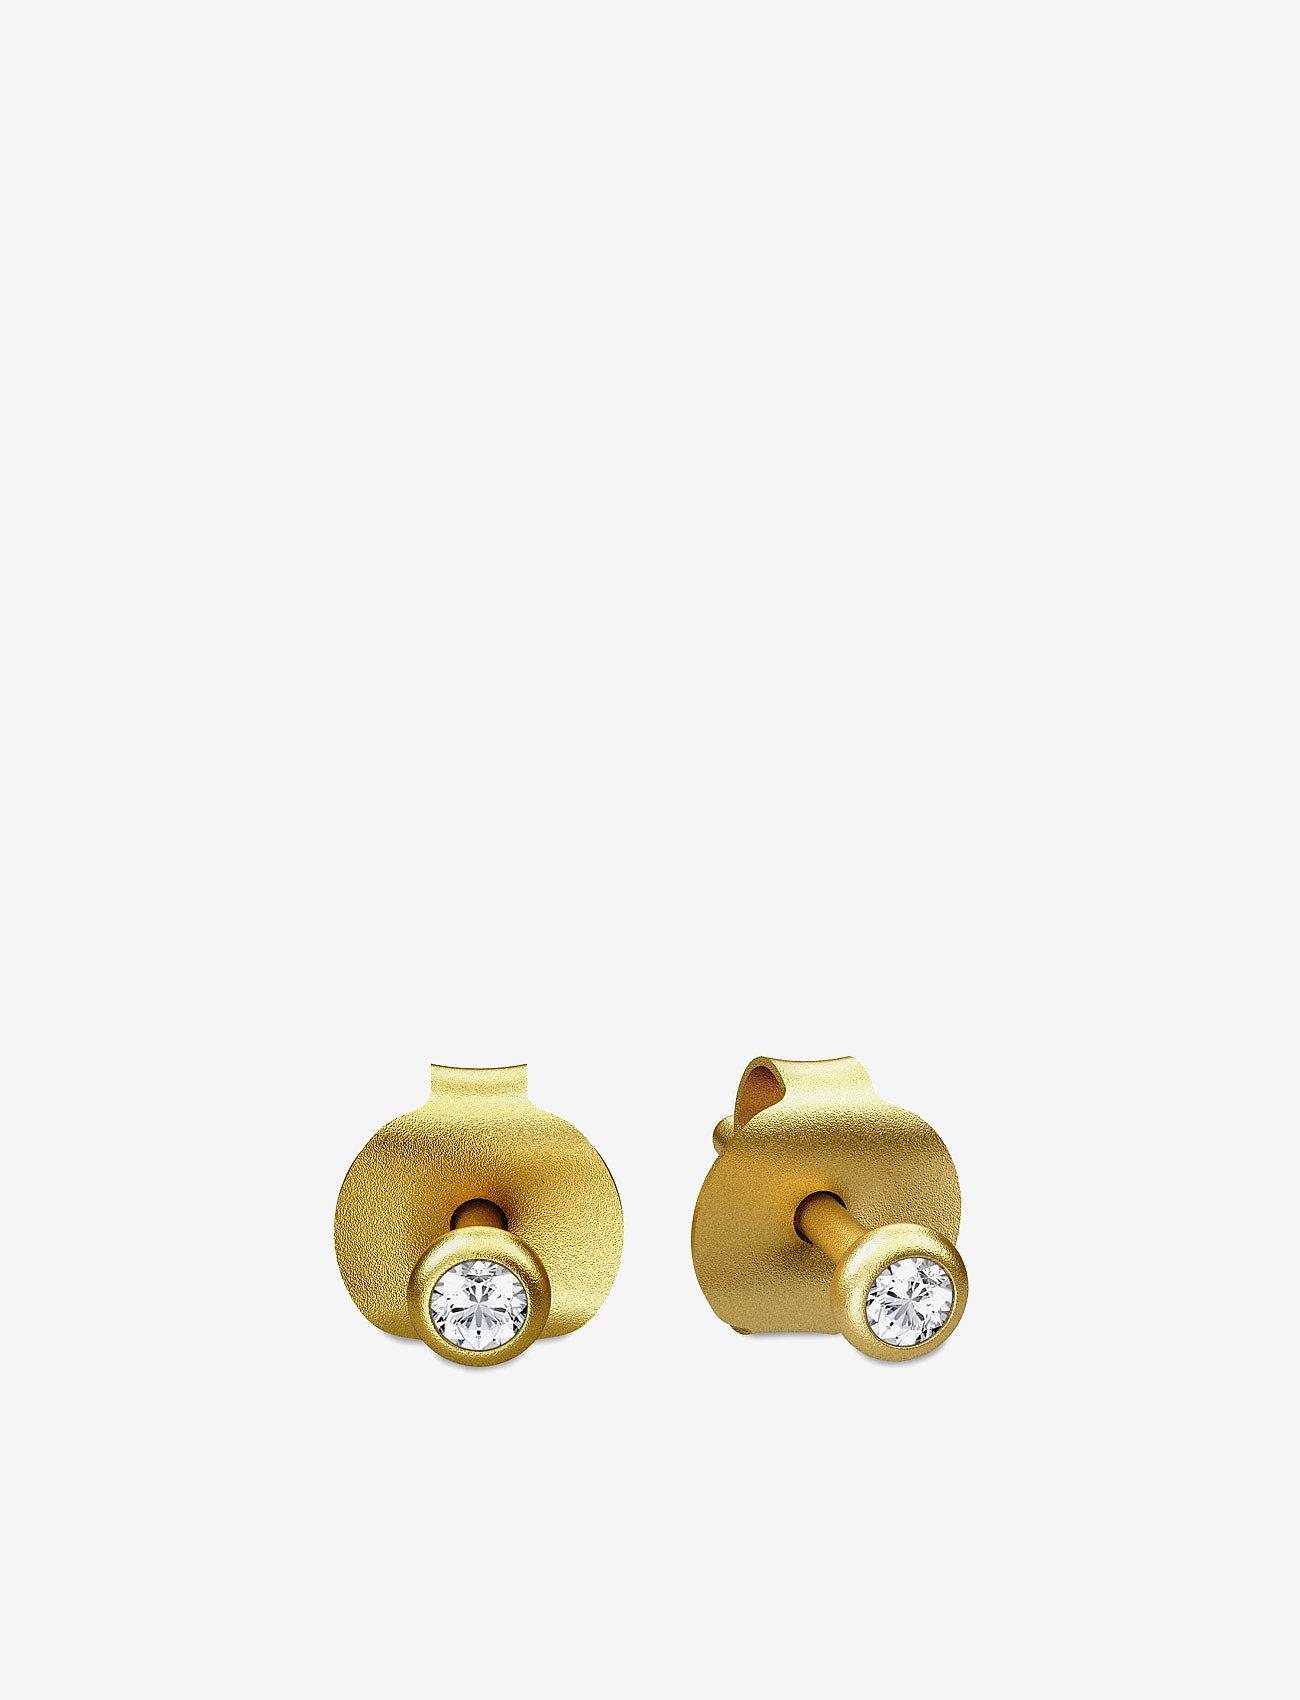 Julie Sandlau - Finesse earring - Gold - studs - gold - 0